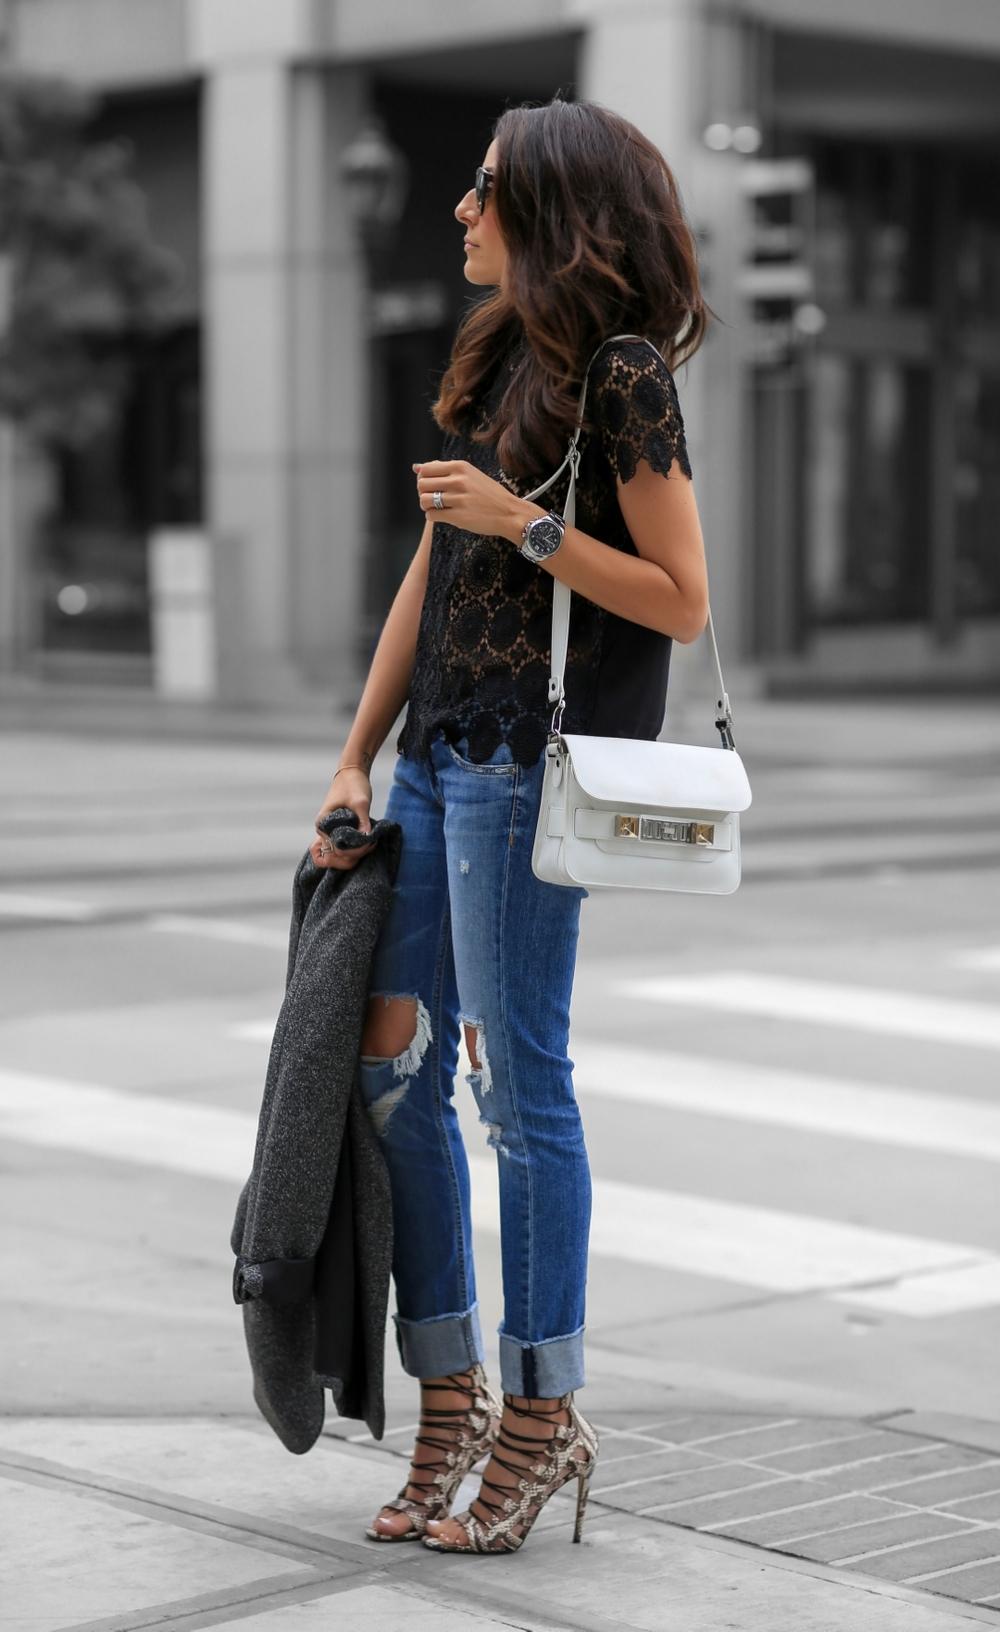 Aquazzura_Zara_FashionBlogger_ProenzaShouler_WhoWhatWear_Target_RagandBone-Jeans.jpg